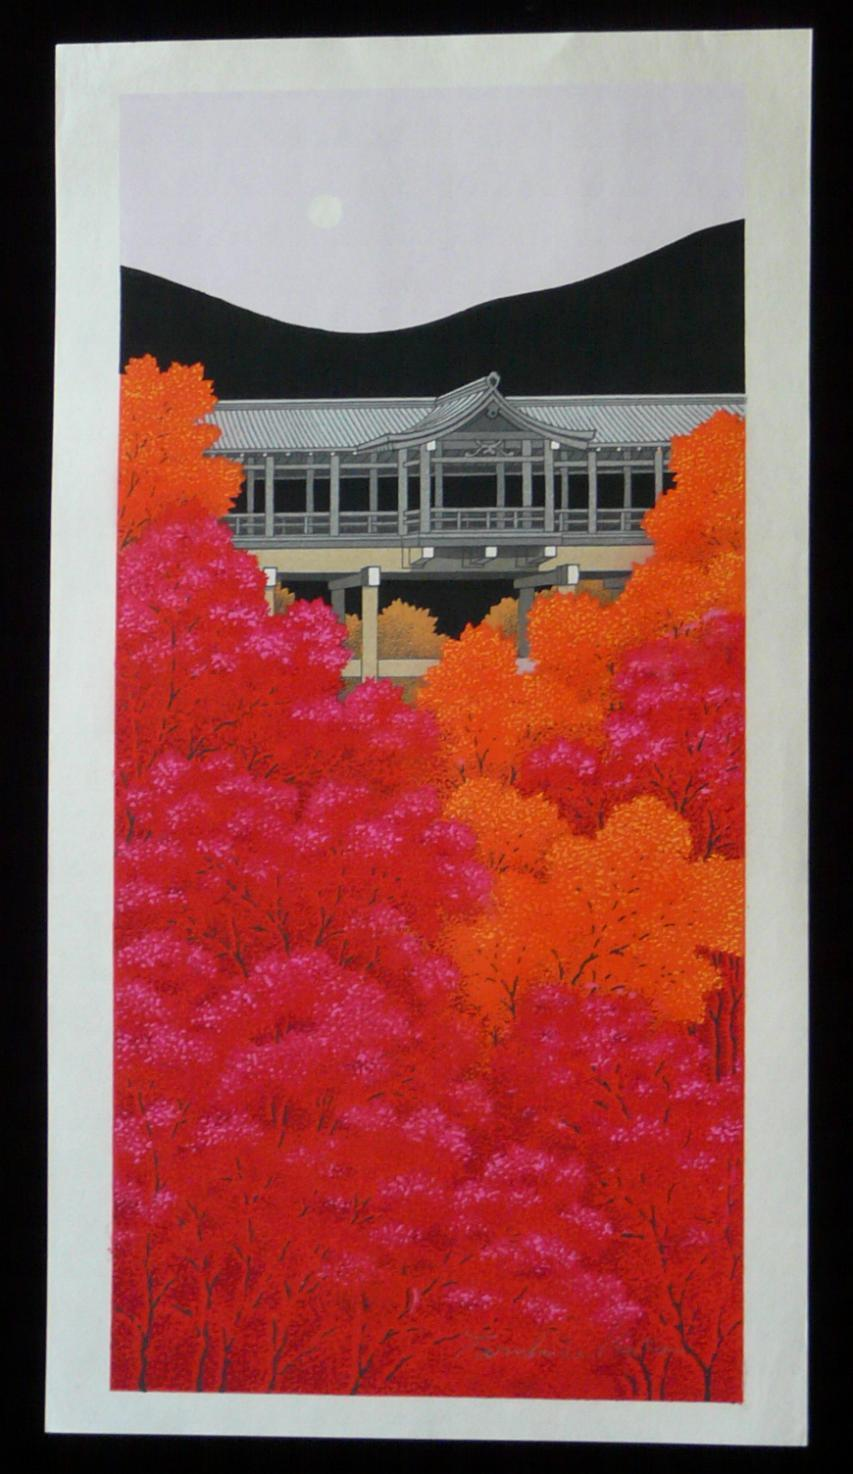 TERUHIDE KATO: #P3727 SPRING AT KIYOMIZU TEMPLE